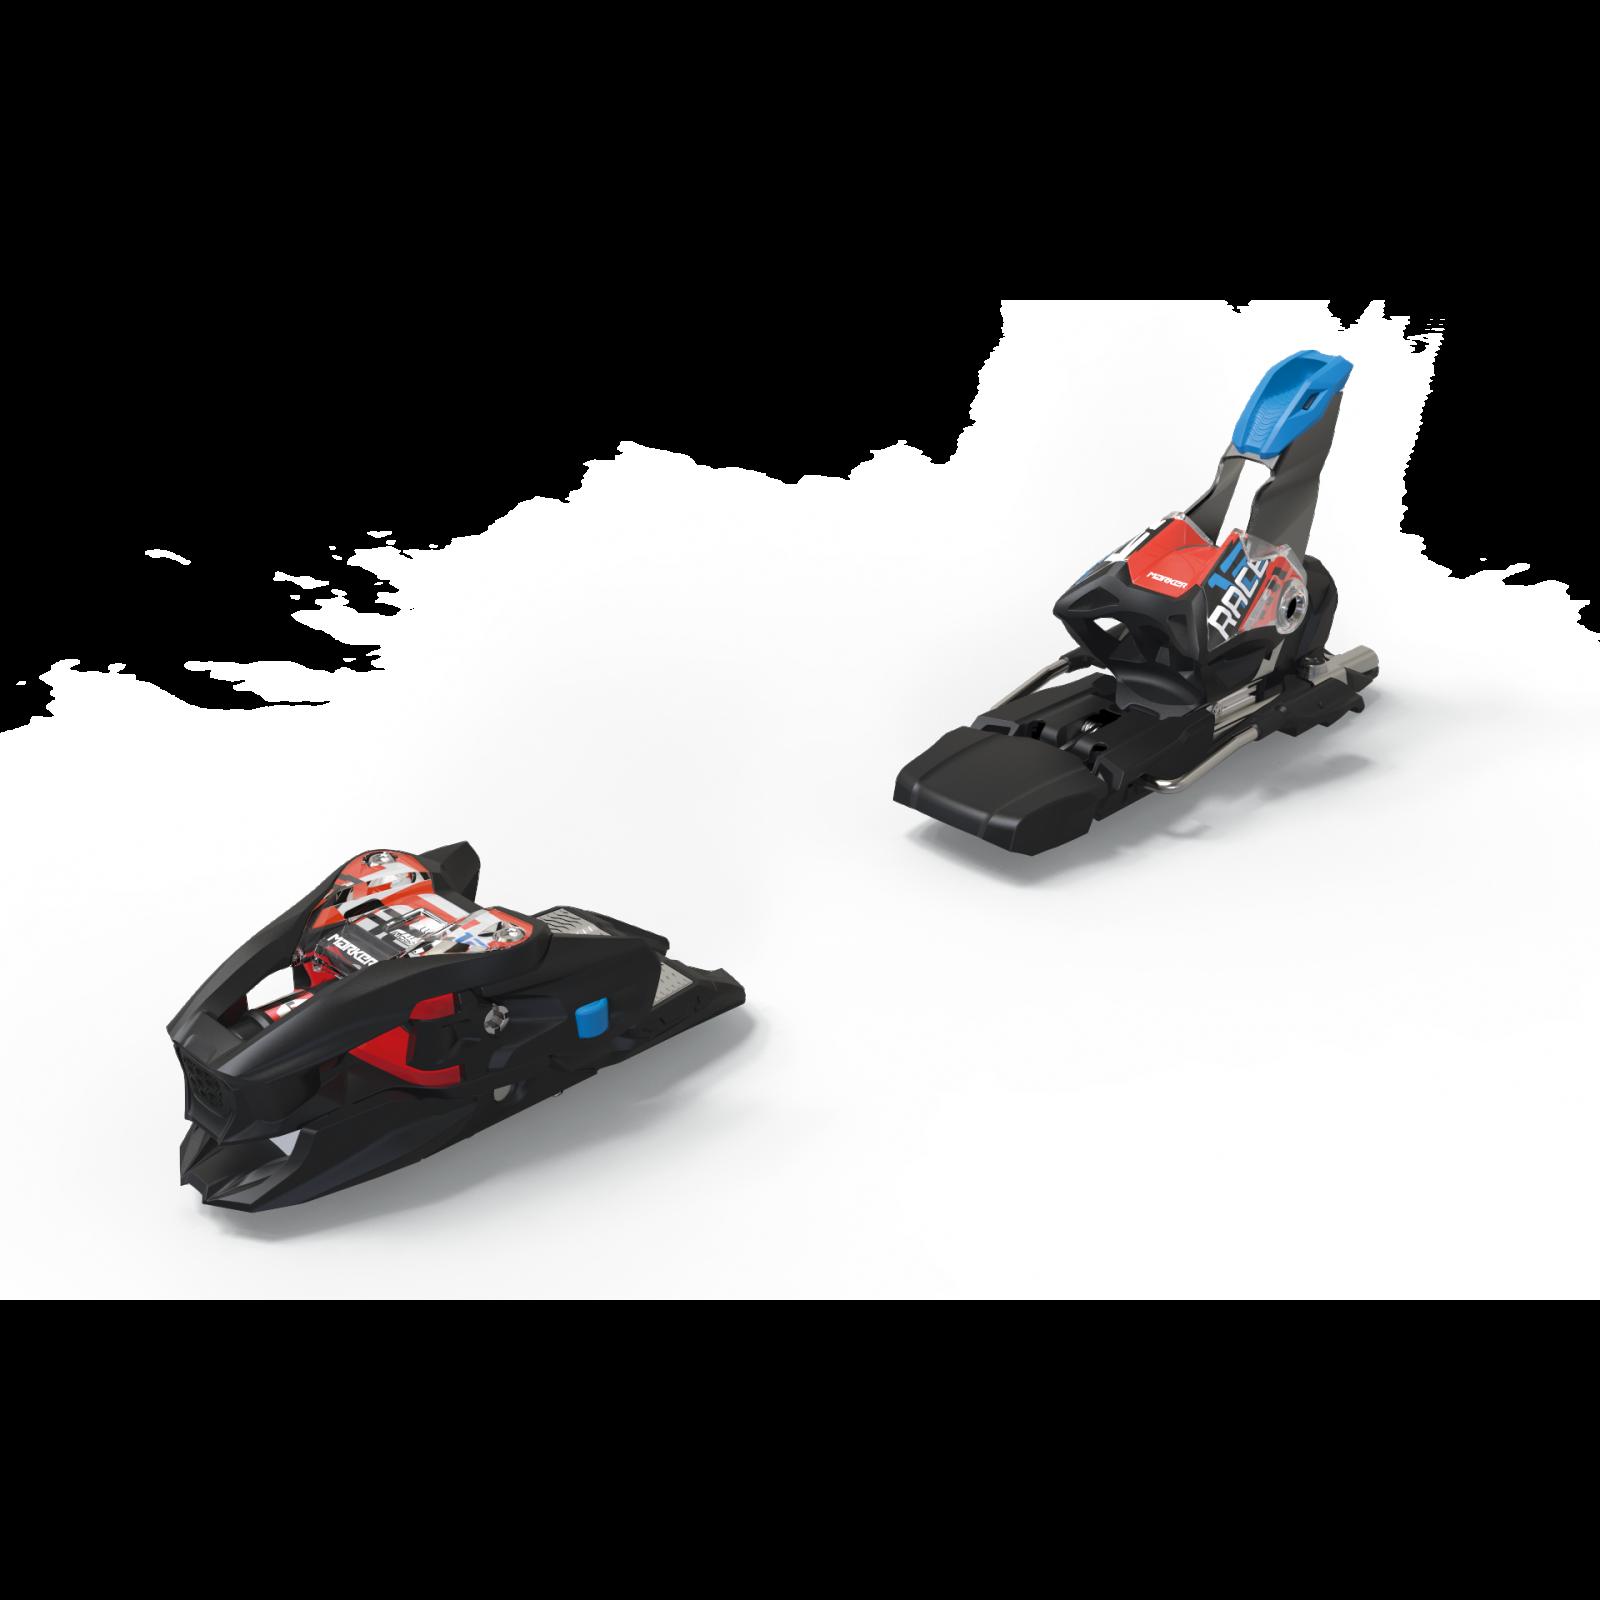 2020 Marker Race Xcell 12 Ski Binding